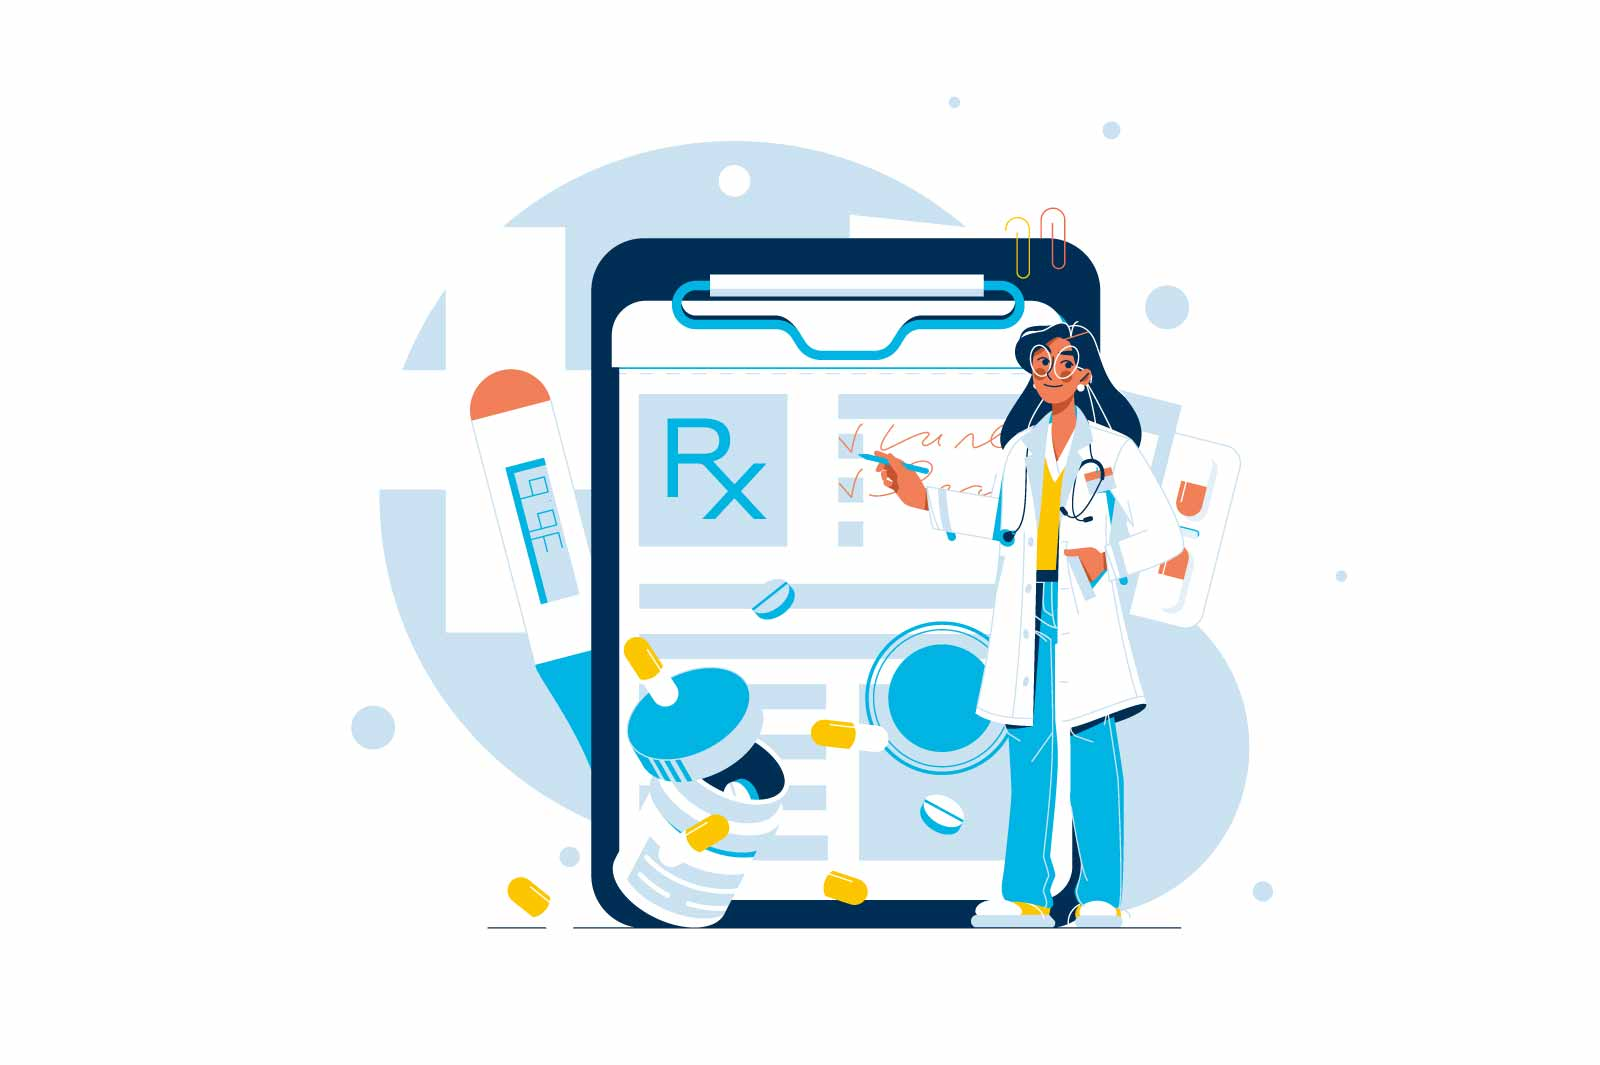 Doctor write prescription for patient vector illustration. Prescription for further care flat style. Treatment, healthcare, medicine concept